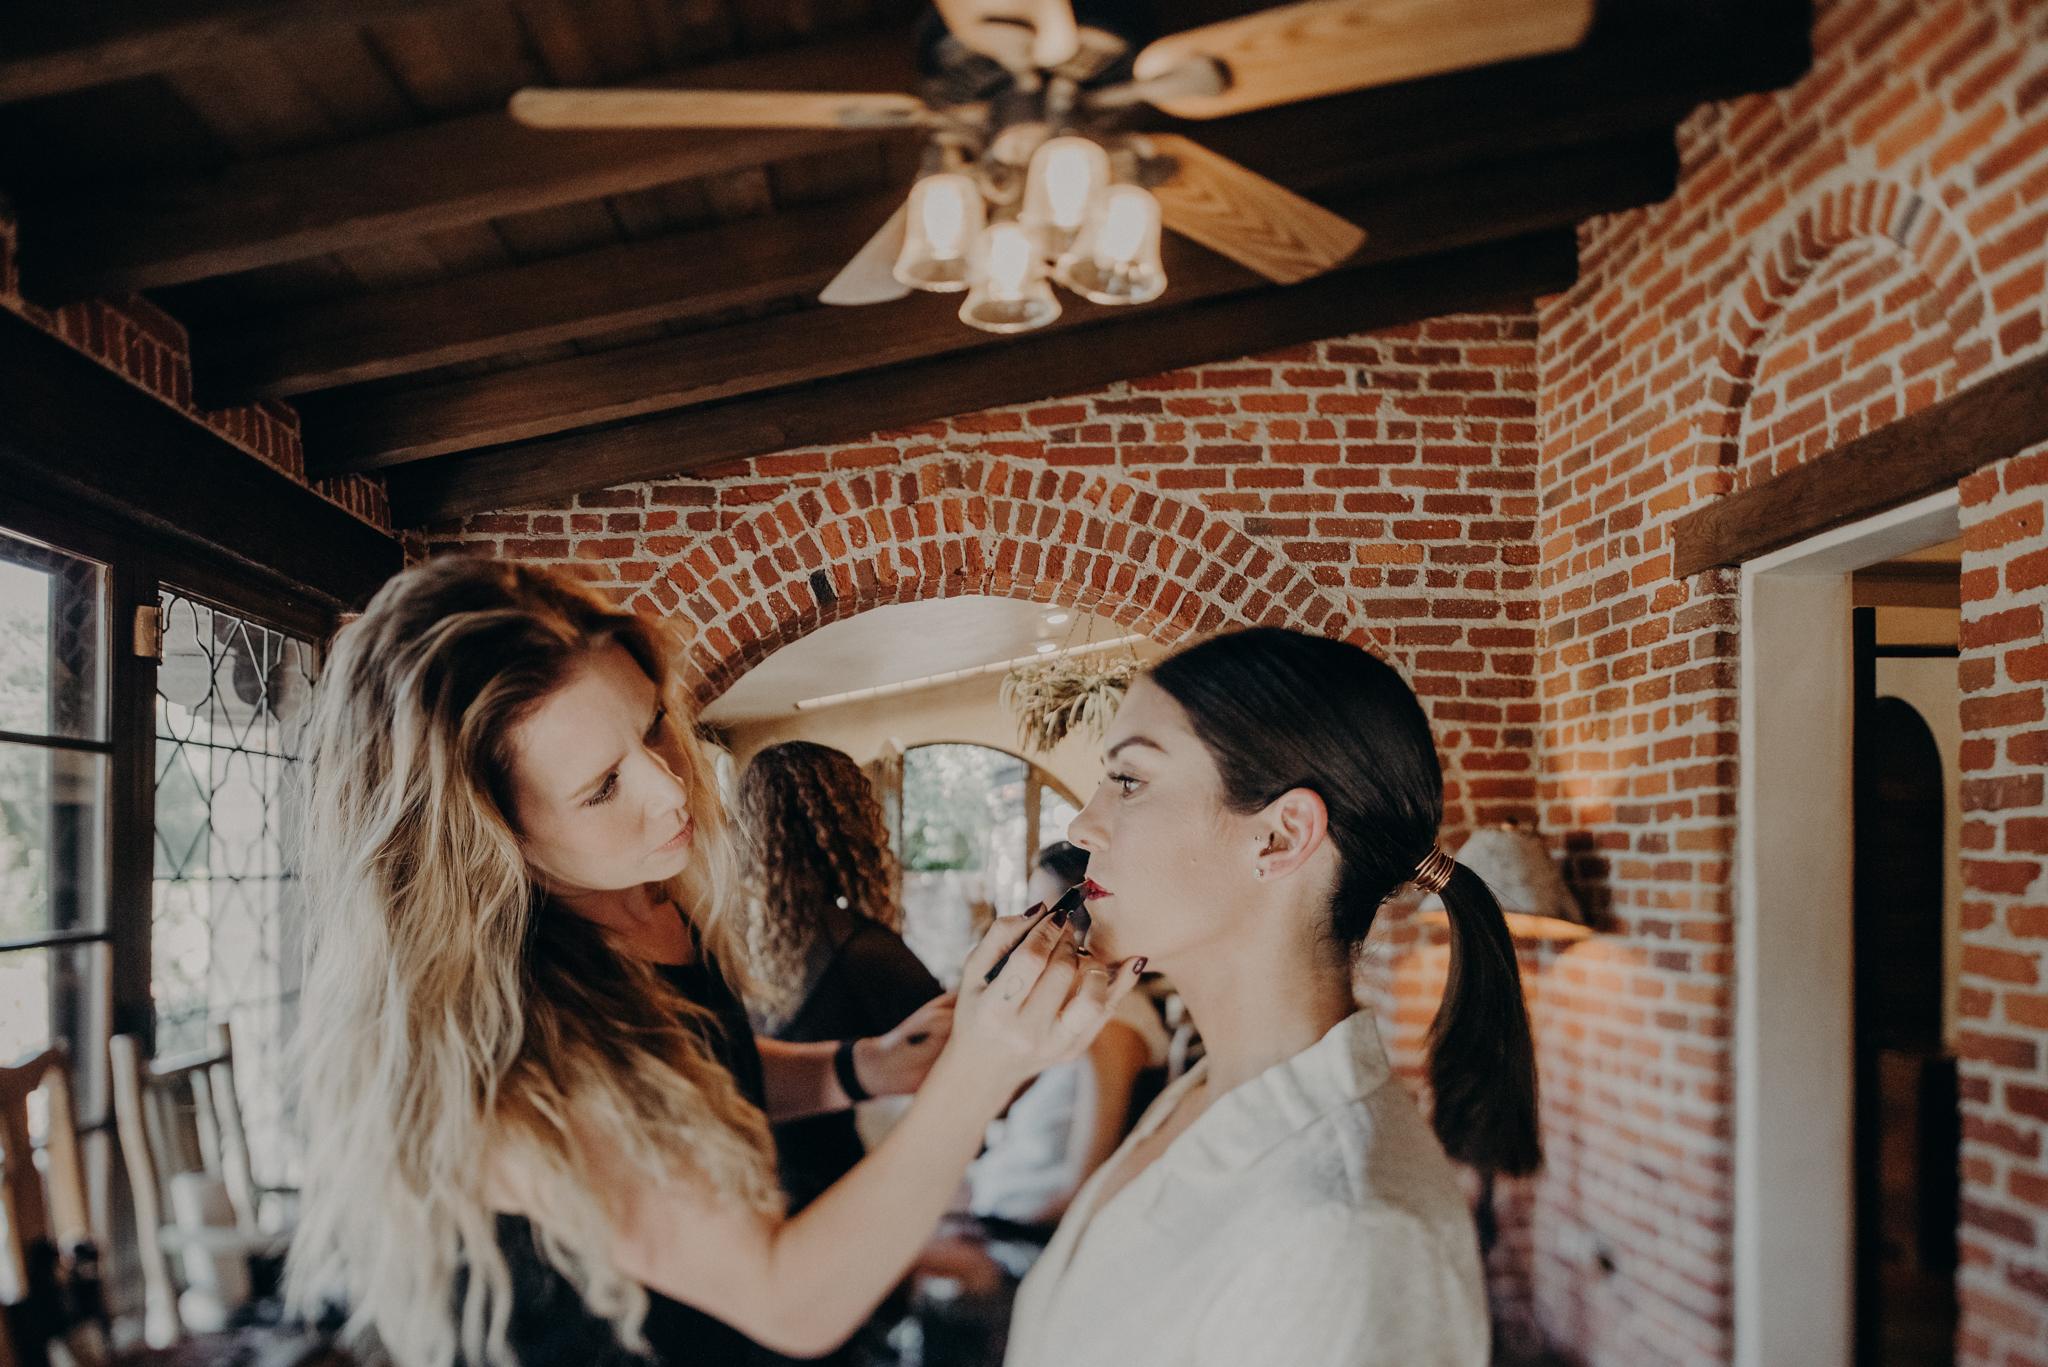 Hummingbird Nest Ranch Wedding - Wedding Photographer in Los Angeles - IsaiahAndTaylor.com-005.jpg